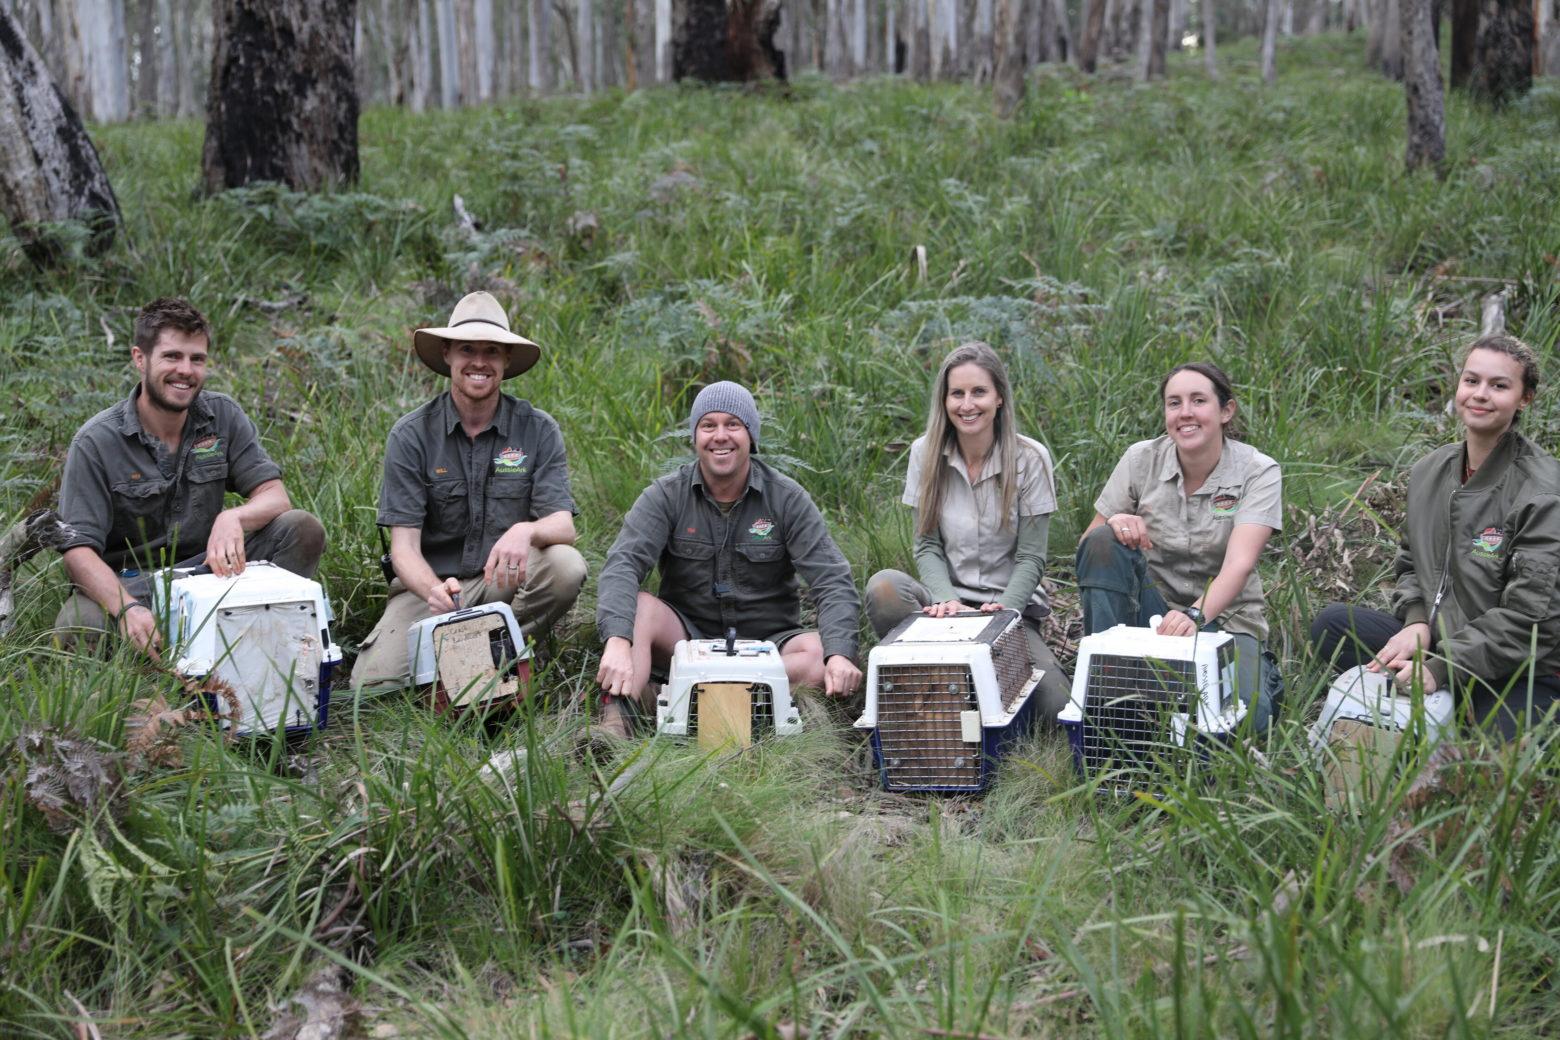 Aussie Ark team releasing Eastern Quolls into Barrington Wildlife Sanctuary